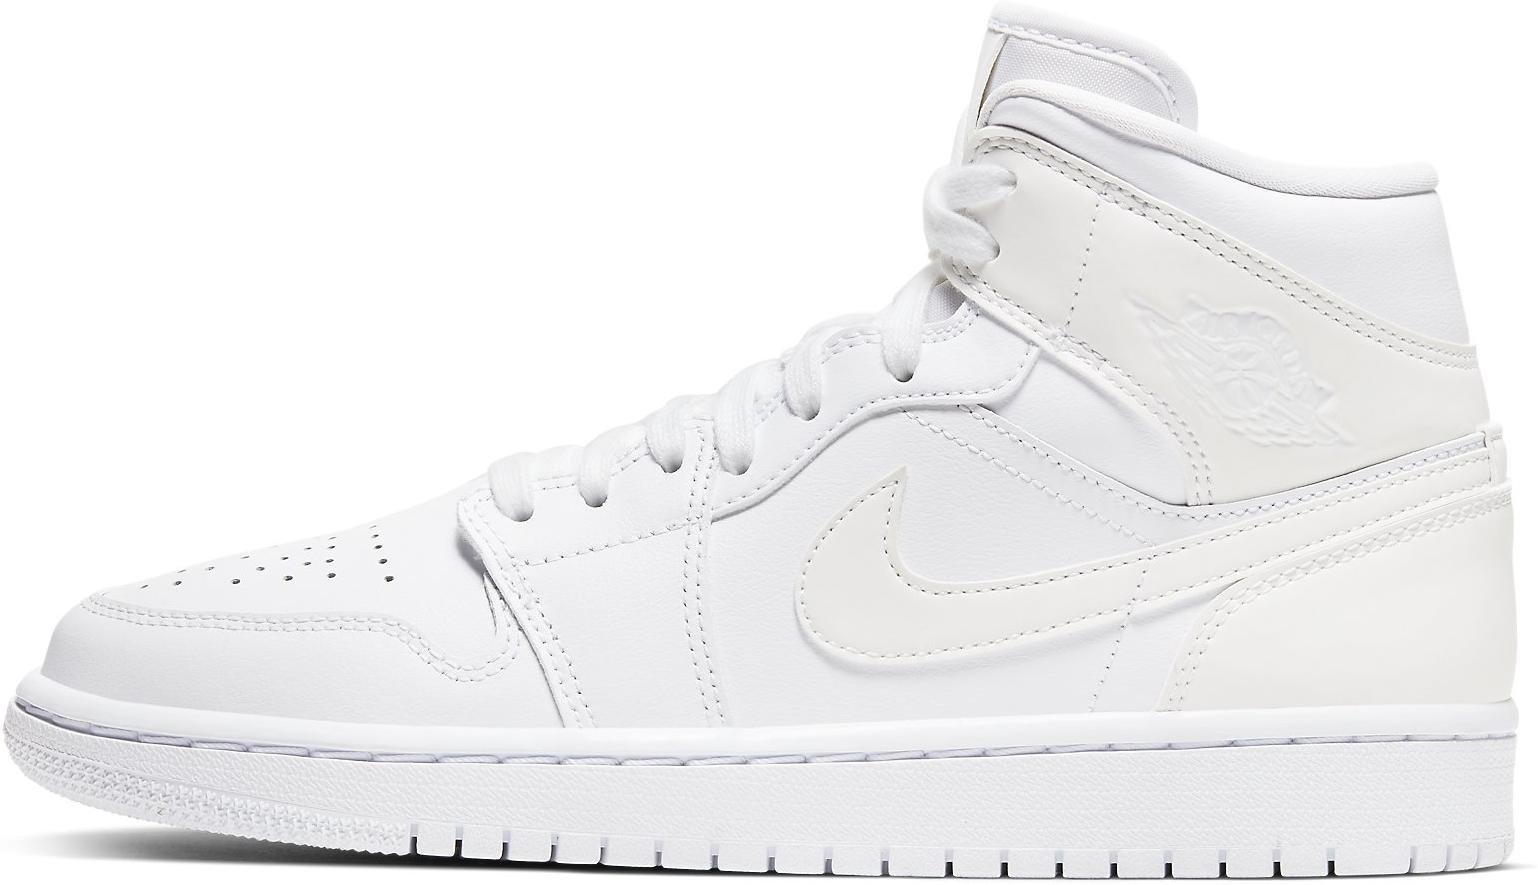 Schuhe Jordan WMNS AIR JORDAN 1 MID